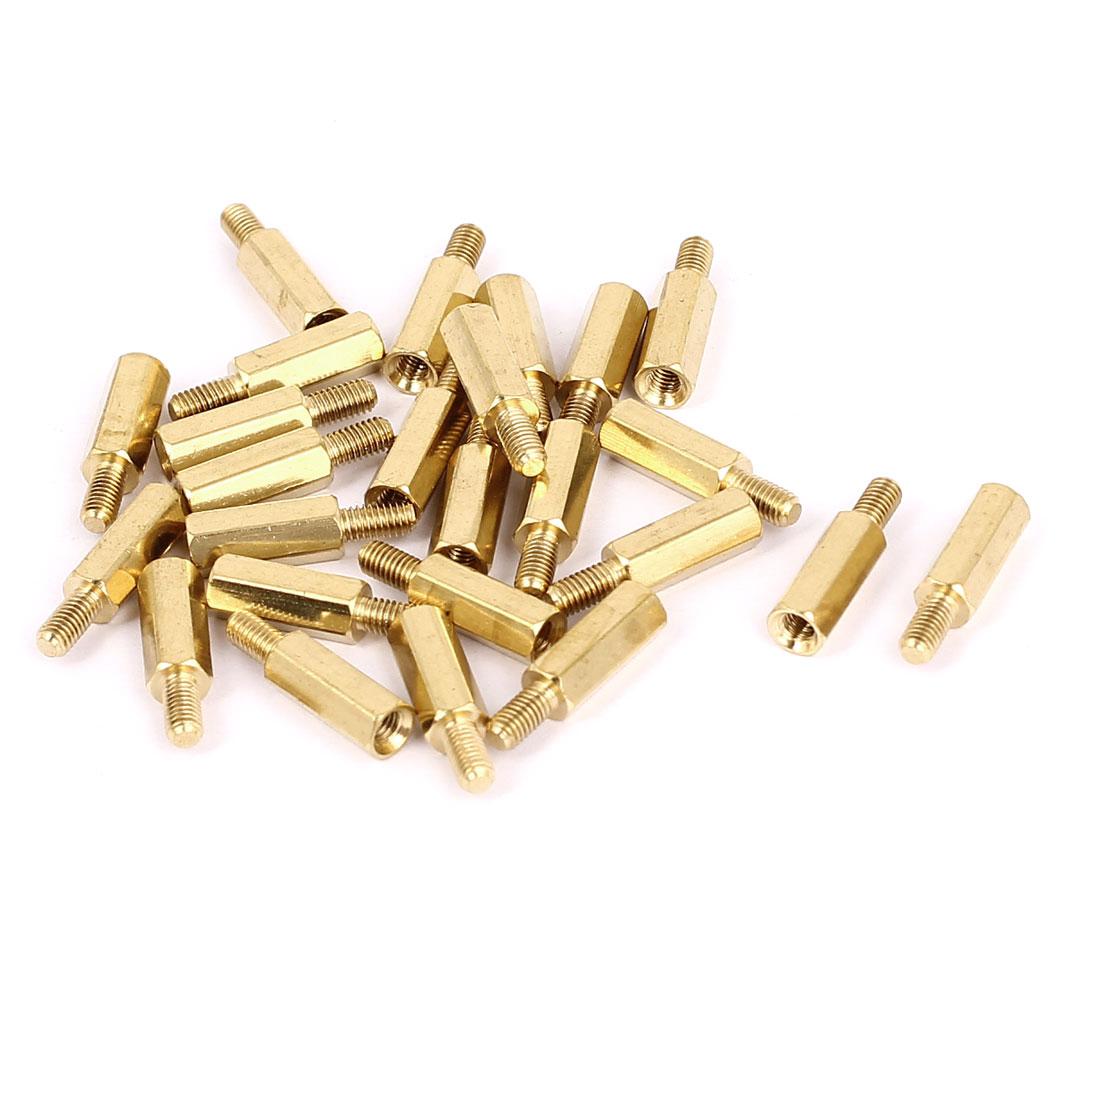 M3x12+6mm Female/Male Thread Brass Hex Standoff Pillar Spacer Coupler Nut 25pcs